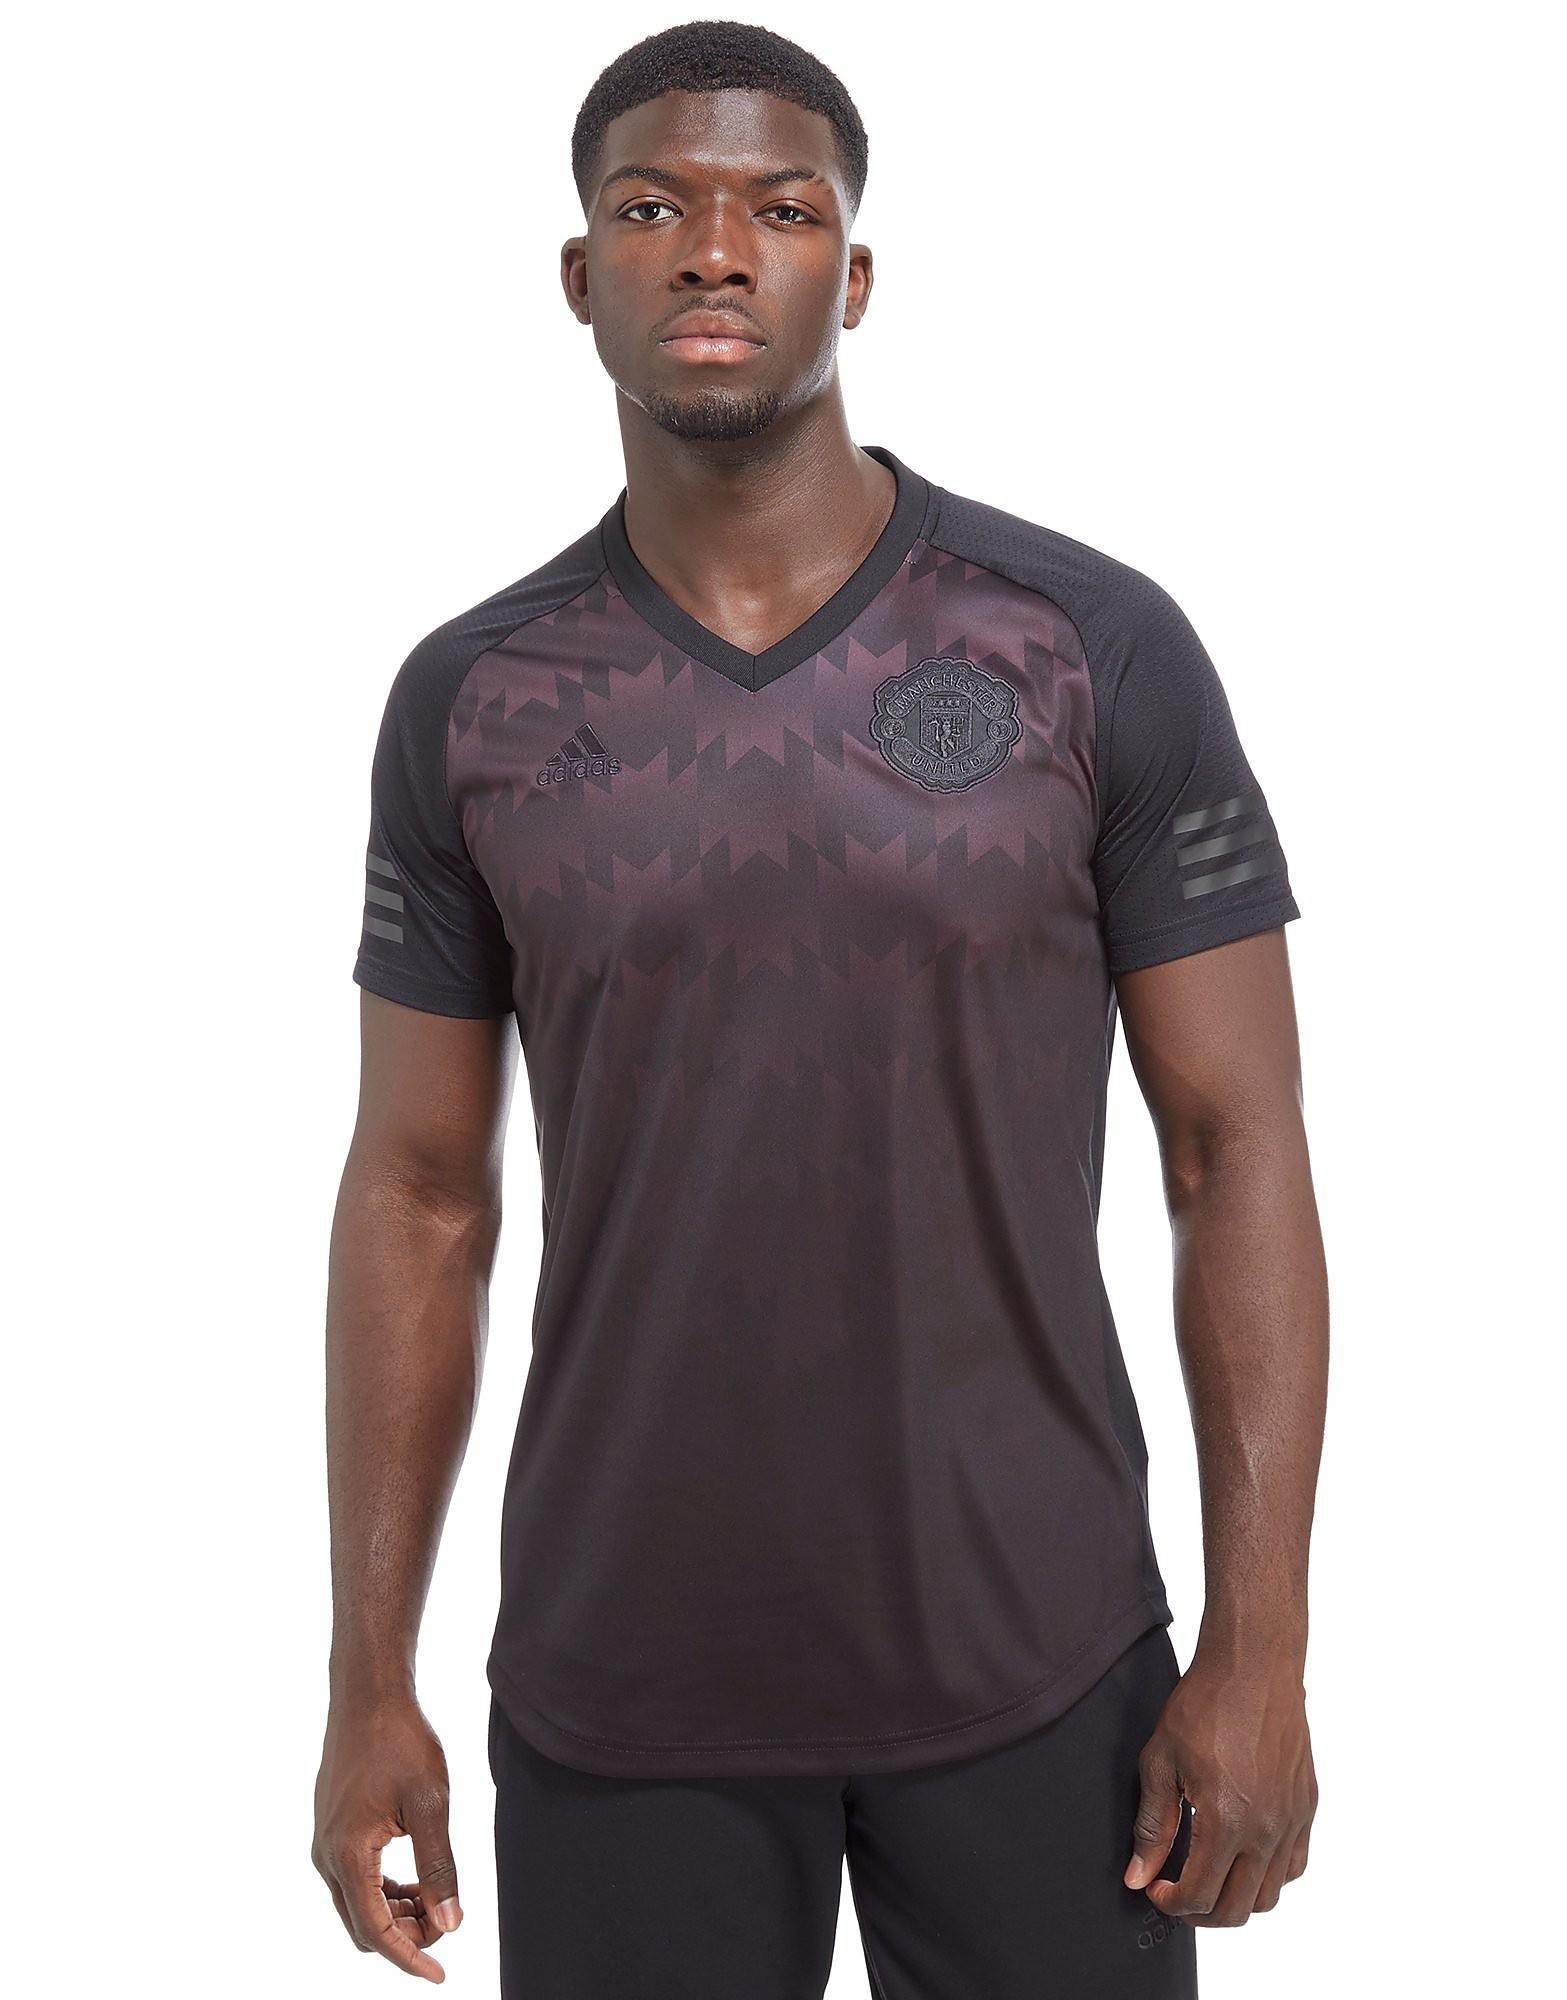 adidas Manchester United 2017 SSP T-Shirt